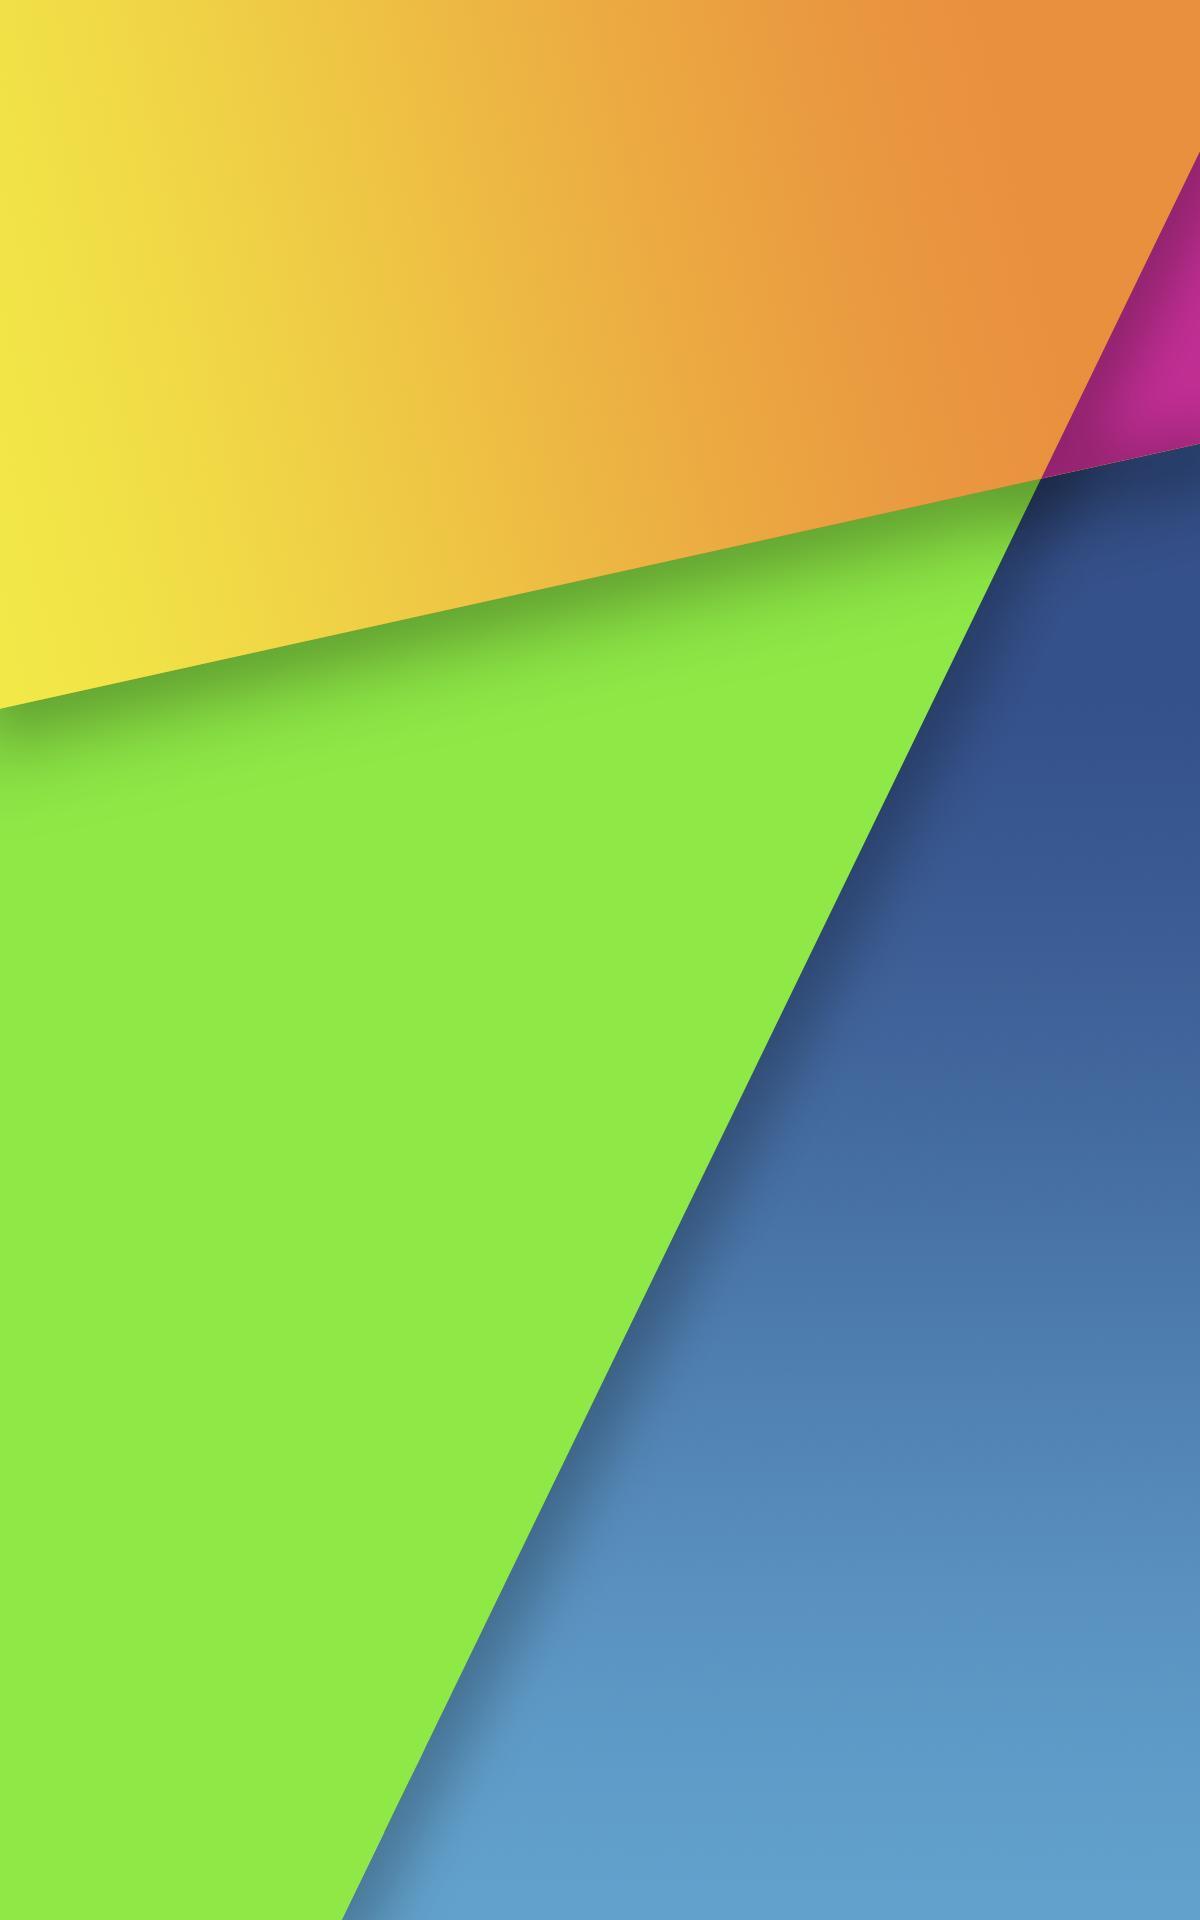 The New Nexus 7 Wallpaper Resized For N4 In Portrait Nexus4 1200x1920